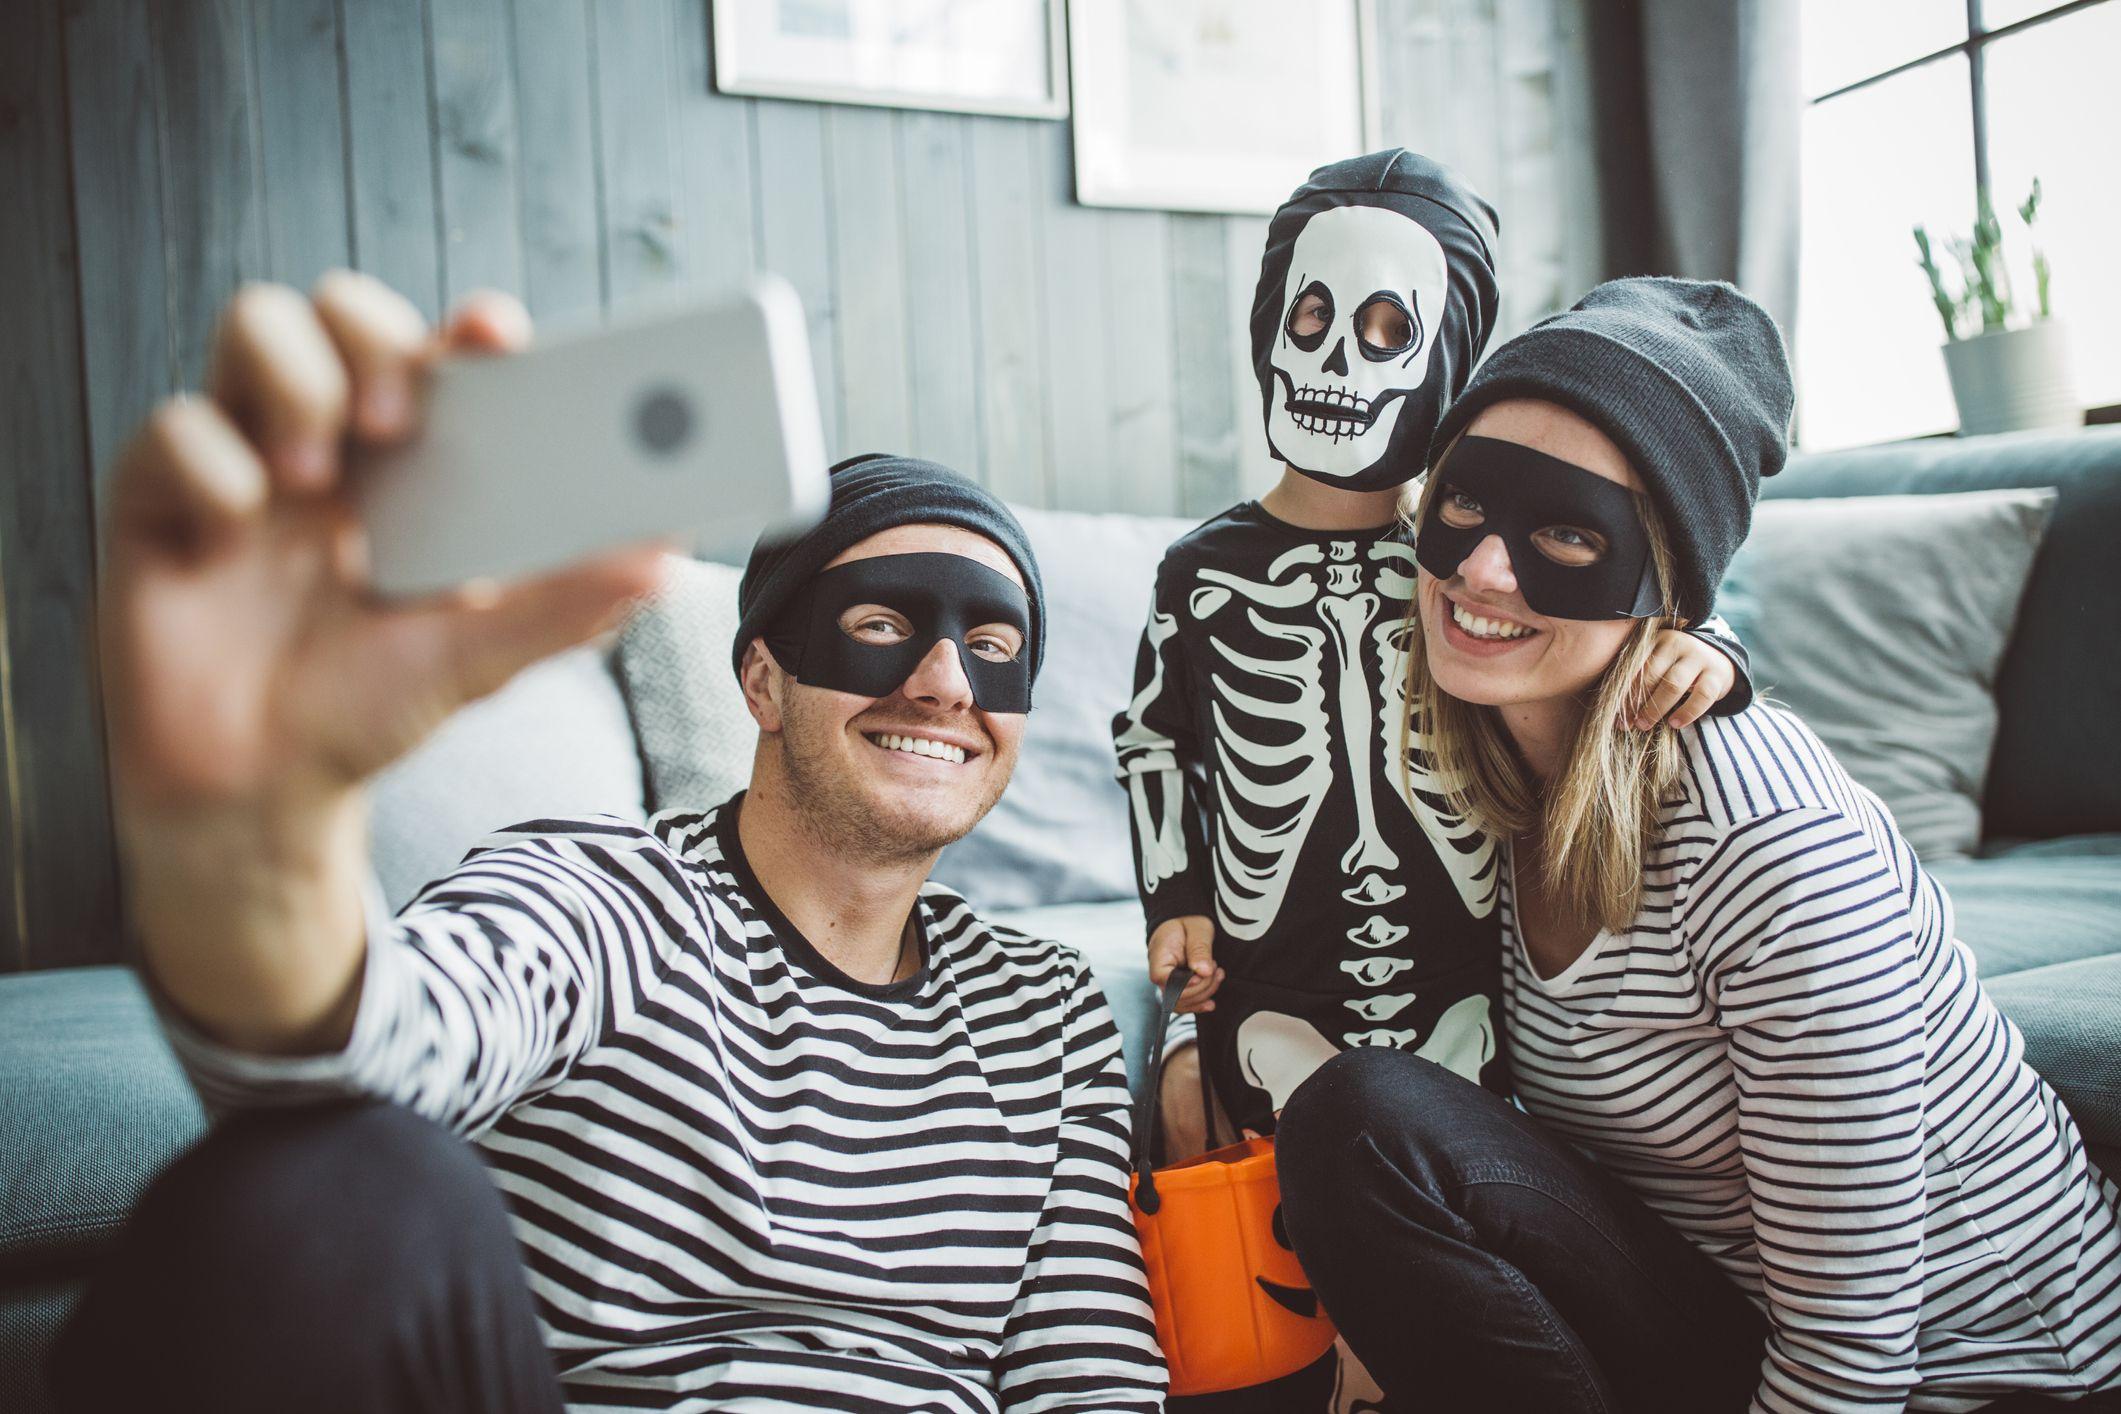 79d5f7b89e 75+ Halloween Captions for Instagram - Cute Photo Captions for Halloween